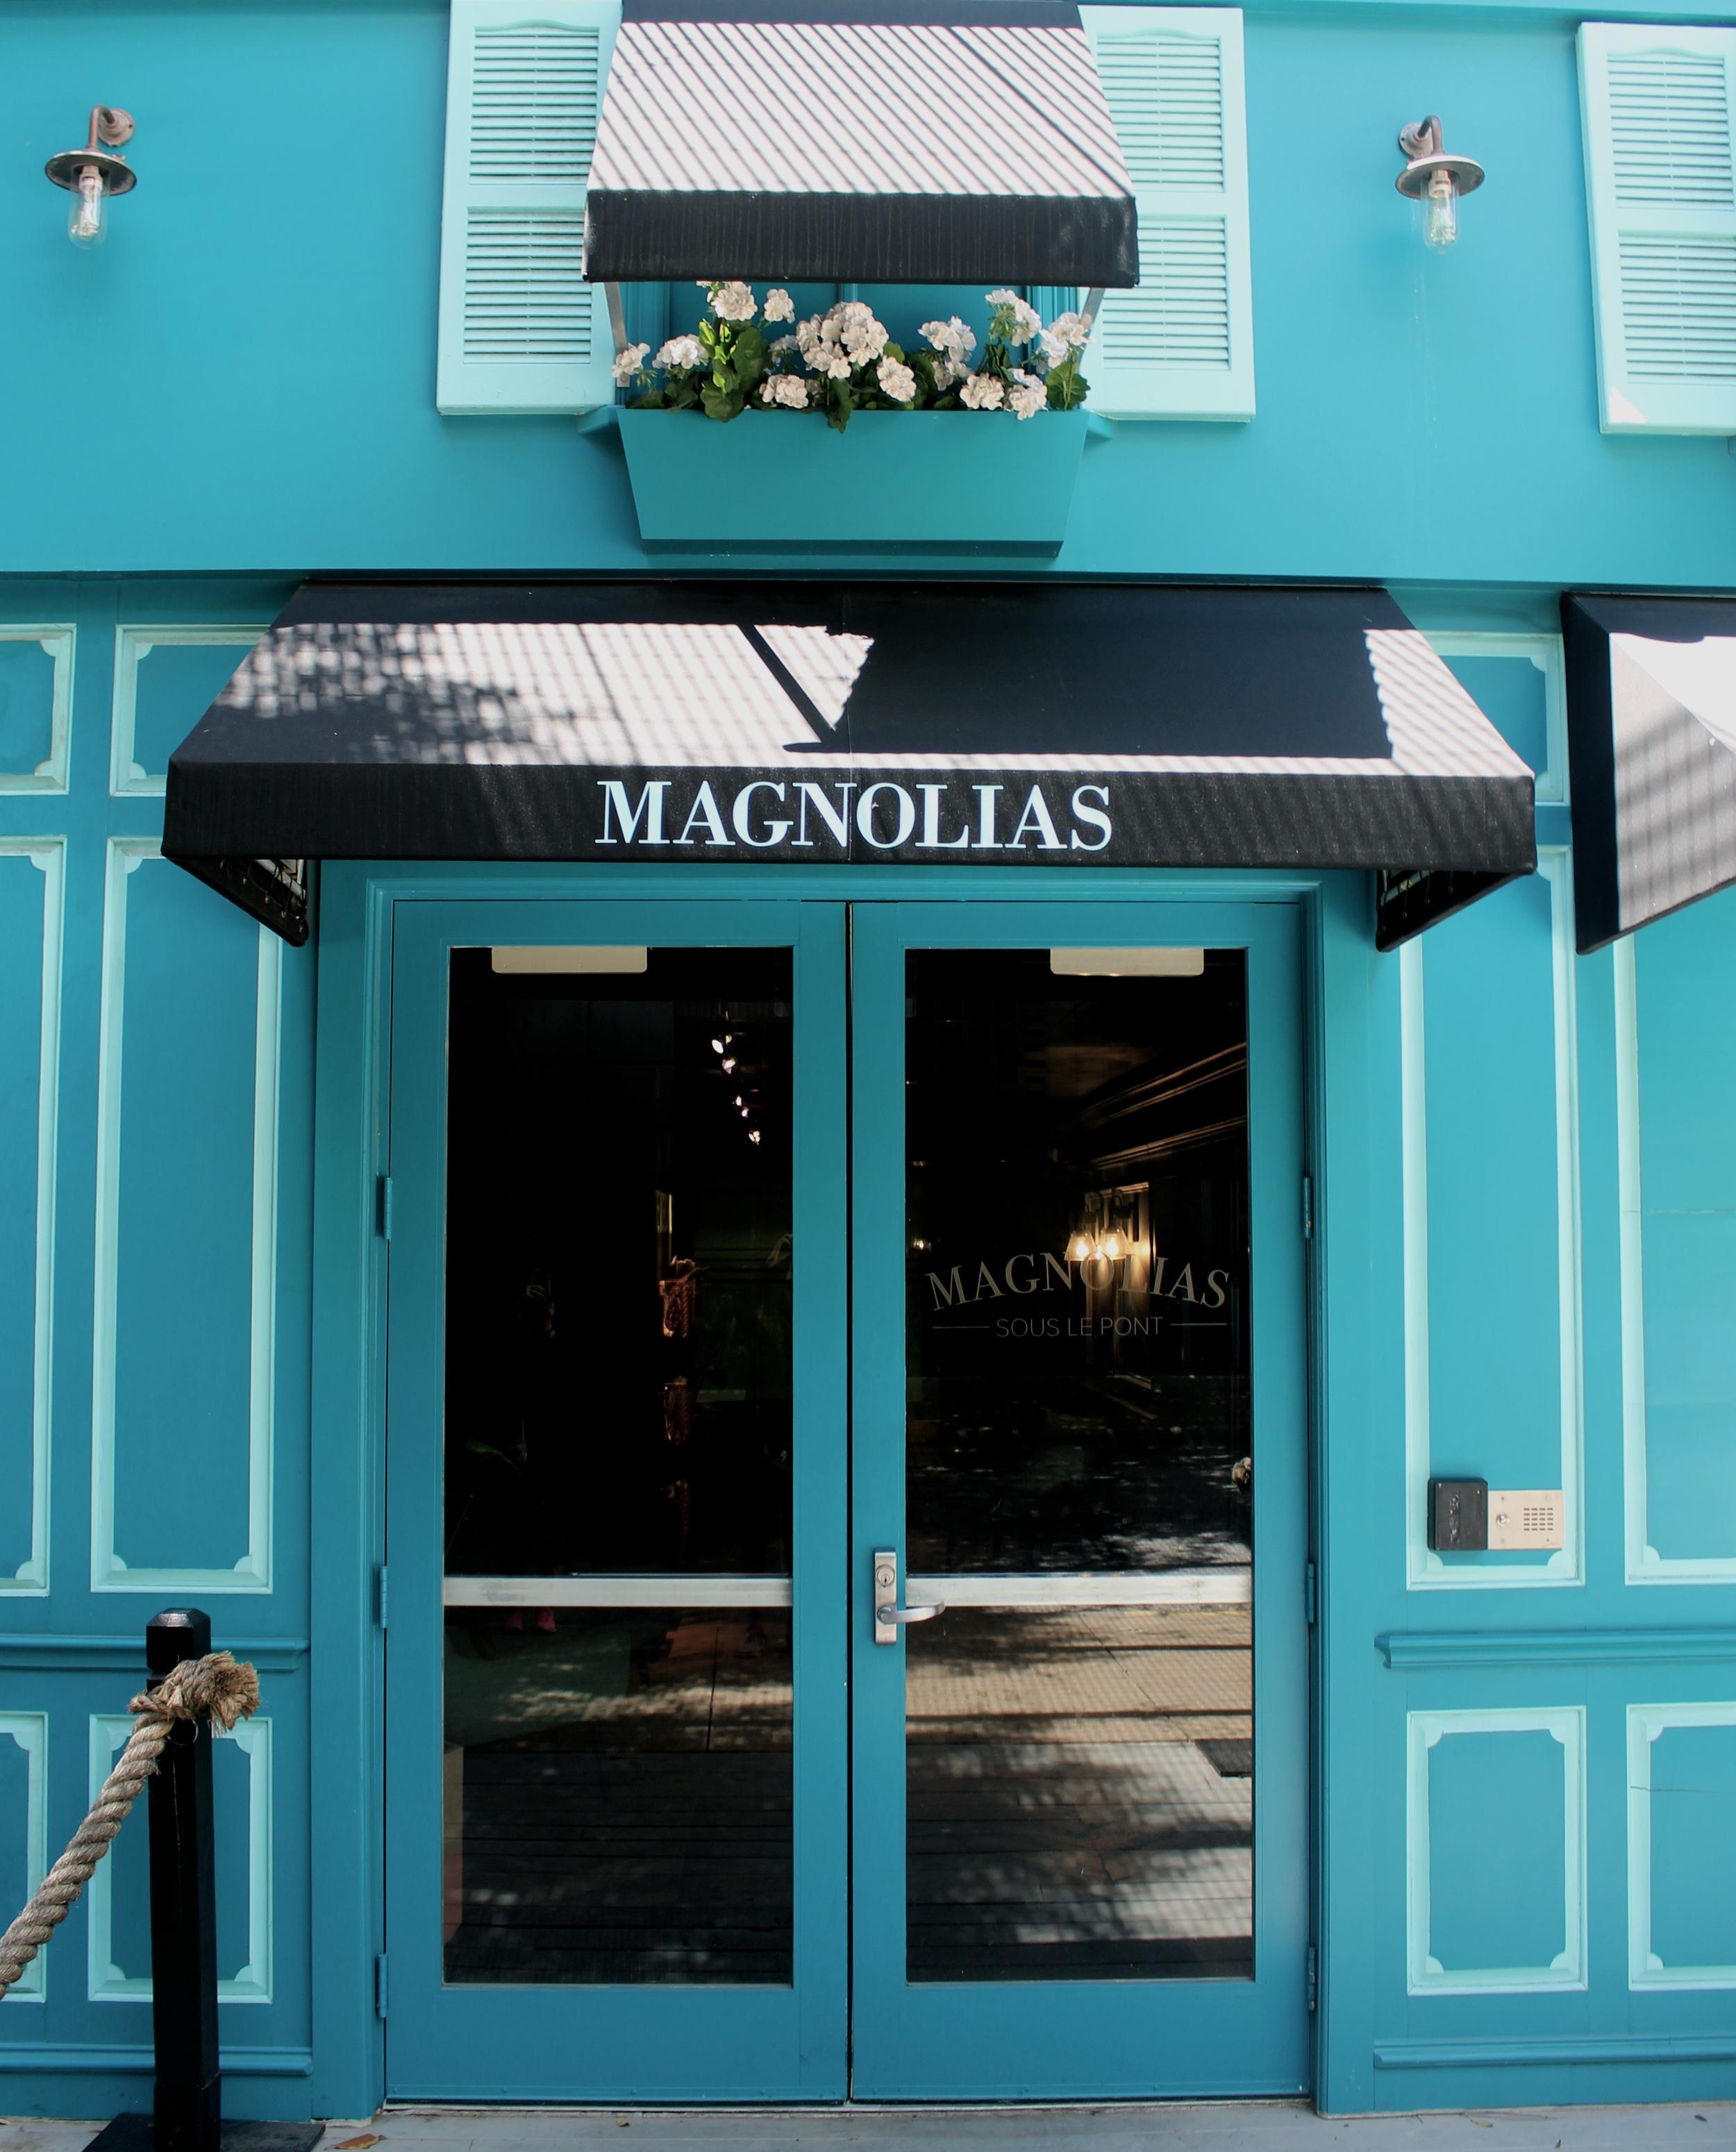 Dallas Coffee Shop Guide Magnolias Sous Le Pont by Miami Blogger Zeinab Kristen | travel & lifestyle blog